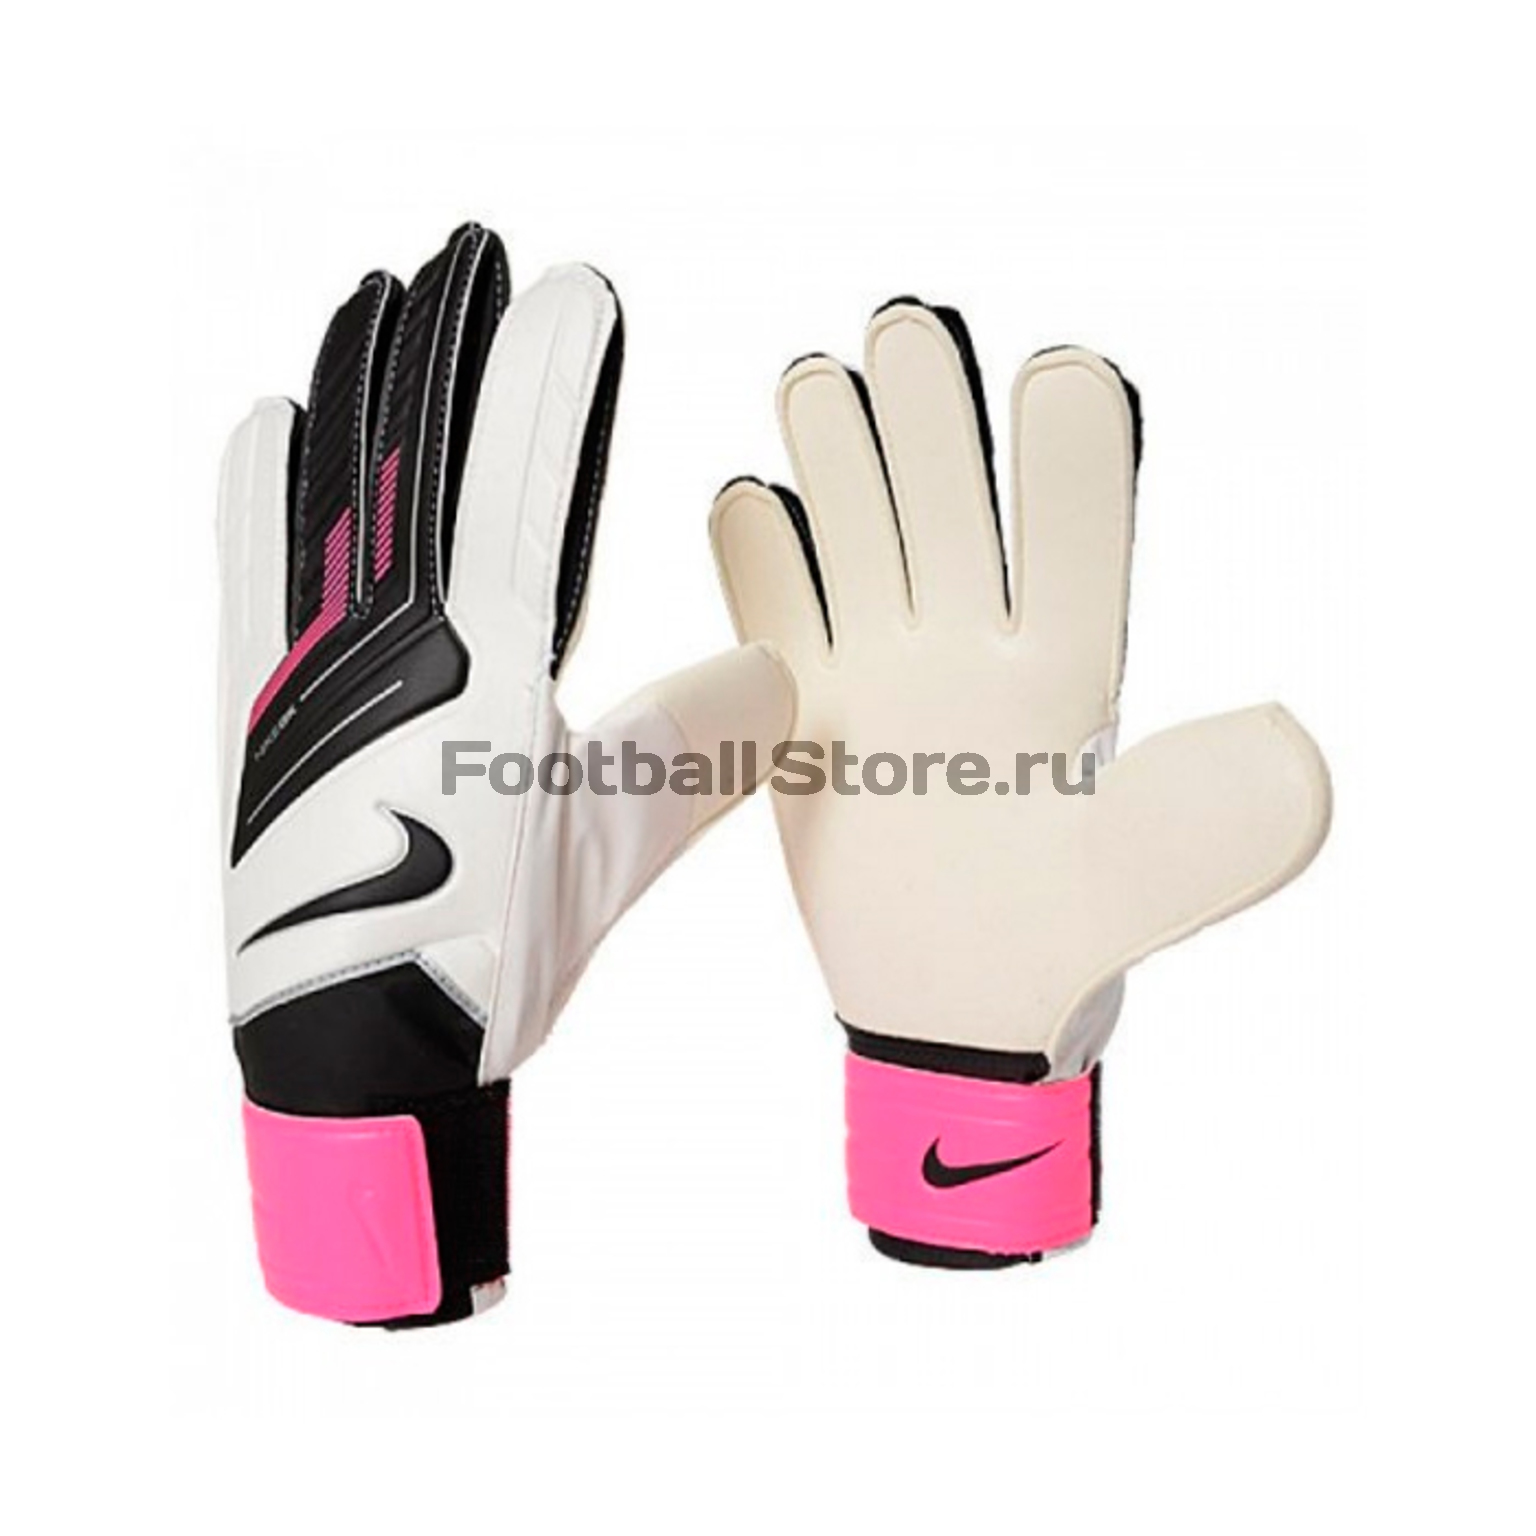 Перчатки Nike Вратарские перчатки Nike GK Classic GS0248-165